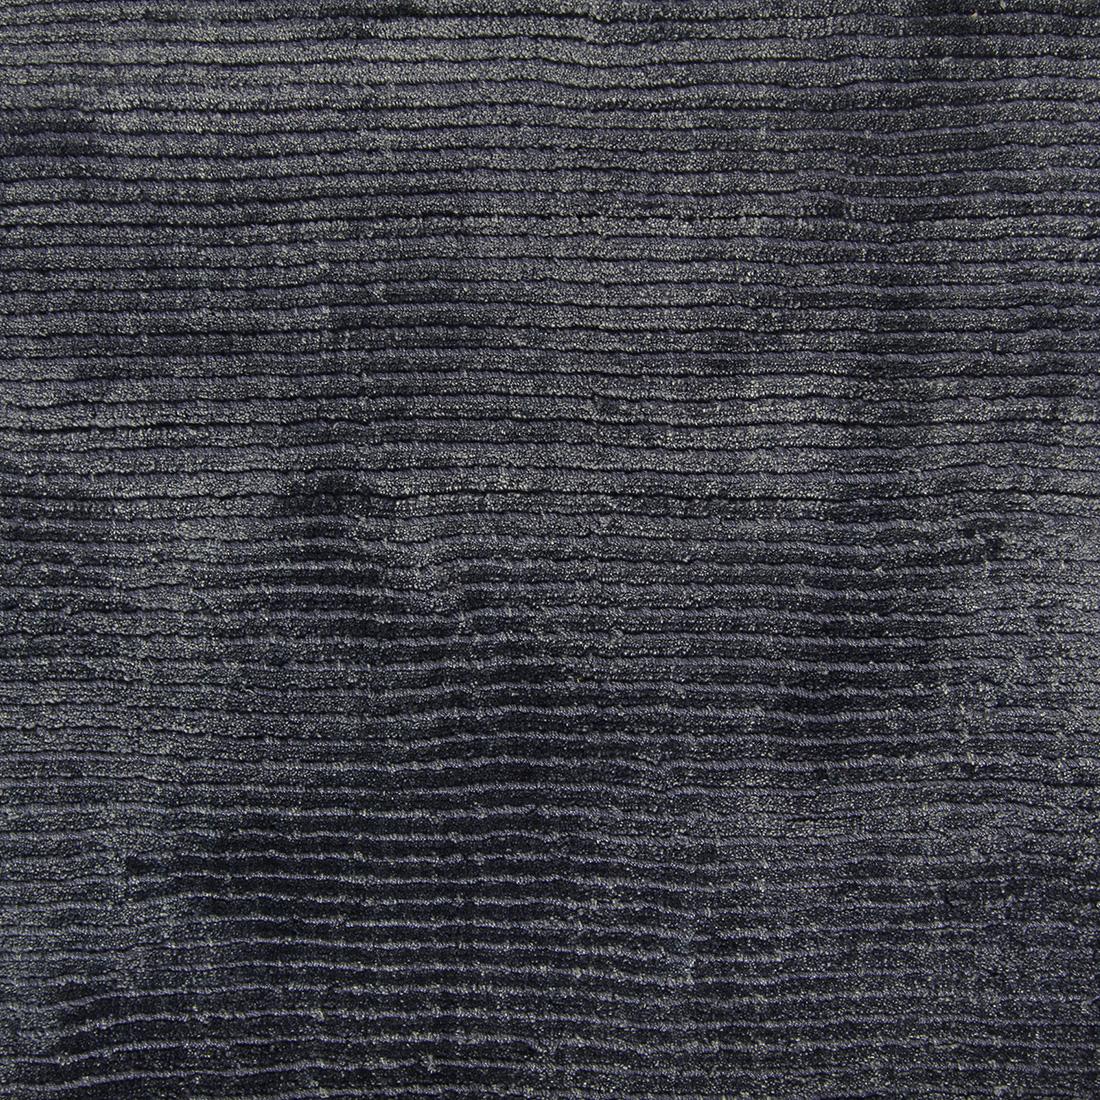 Vloerkleed Brinker Oyster Navy Blue | 170 x 230 cm